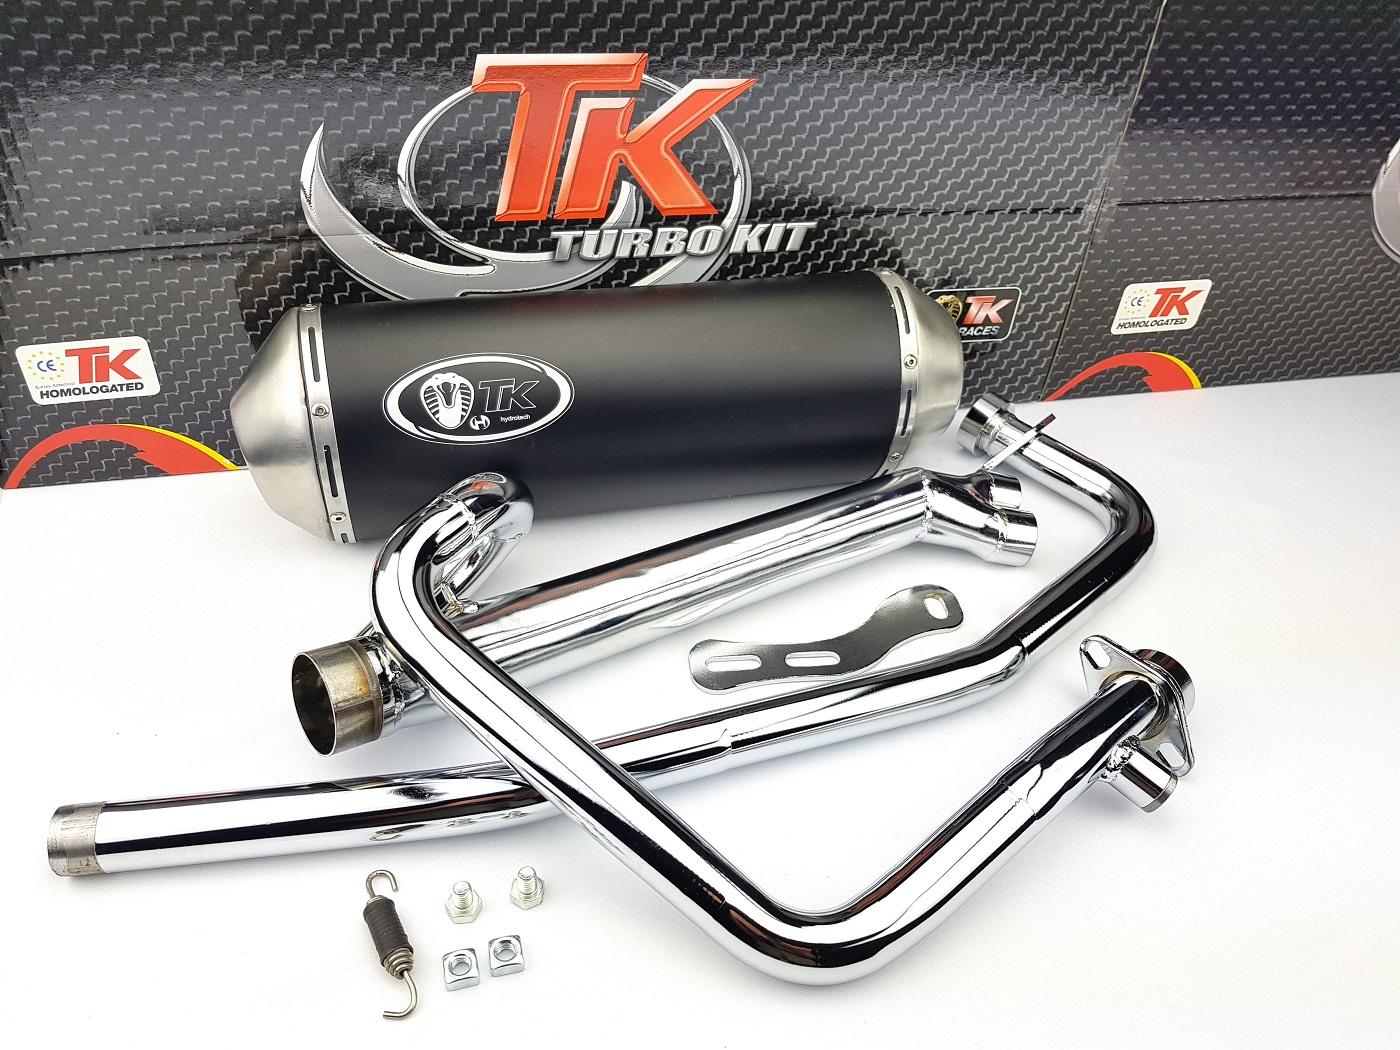 Turbo Kit X-Road 2-in-1 Edelstahl Auspuff Hyosung GT N E3